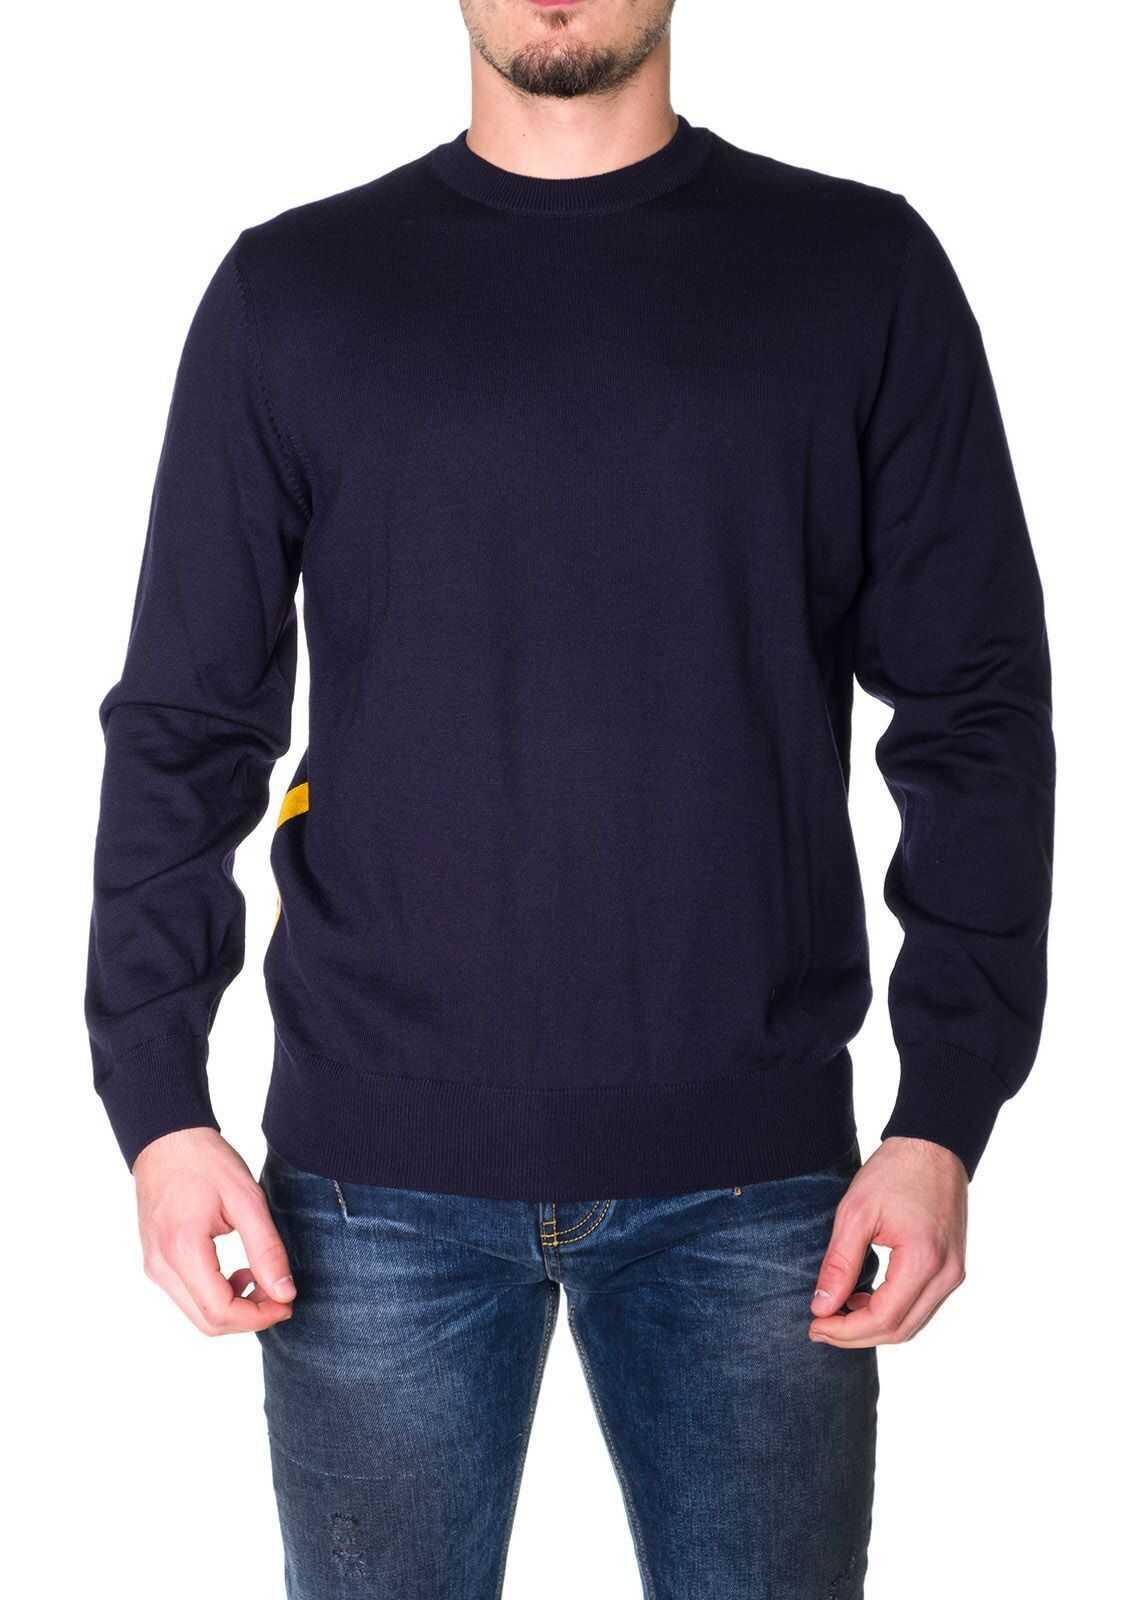 BOSS Hugo Boss Wool Sweater BLUE